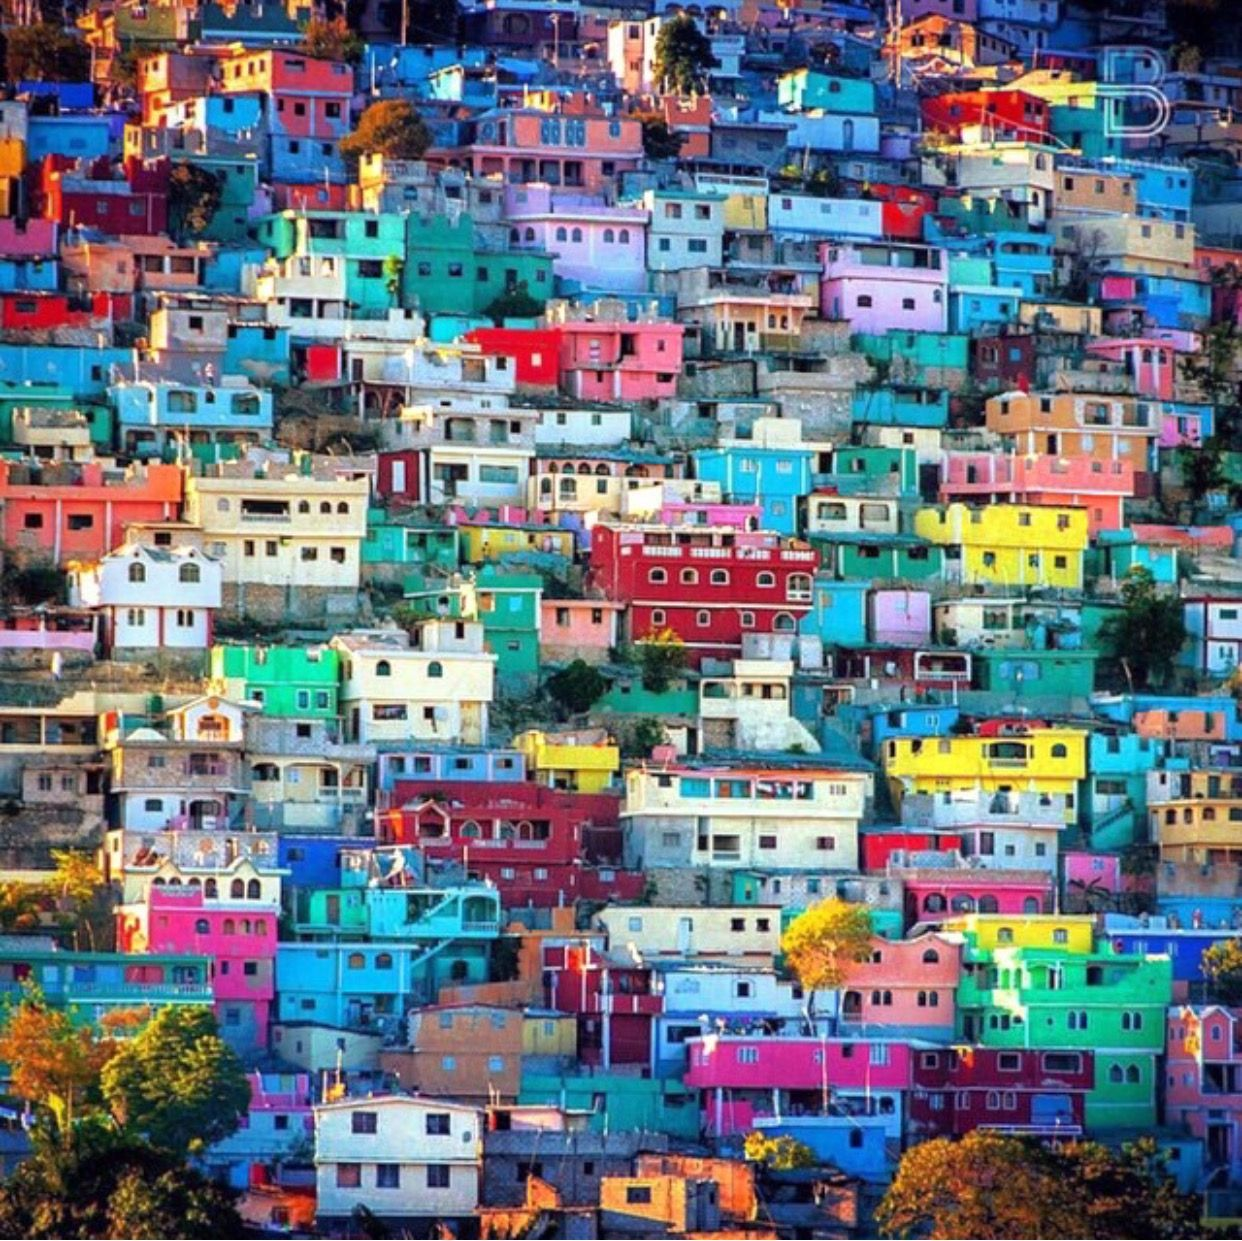 Pin By La Susa On A Colorful World Port Au Prince Haiti Tourism Port Au Prince Haiti